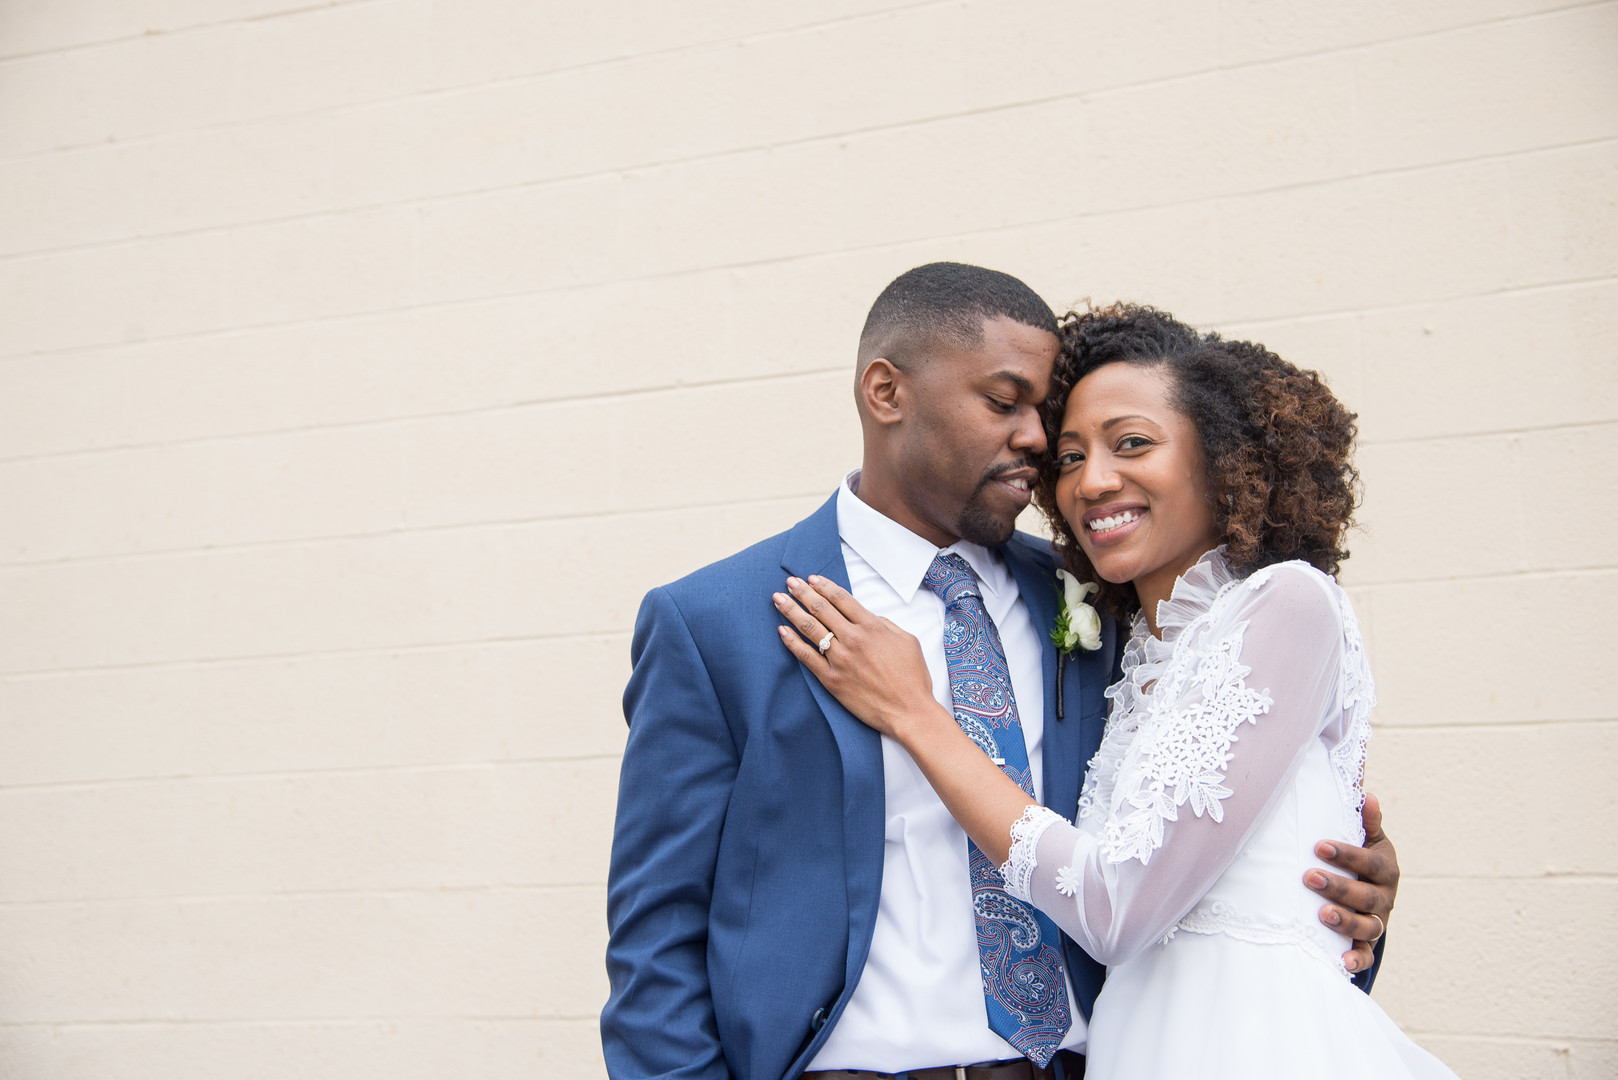 A Surprise North Carolina Wedding – Jocelyn and Harold